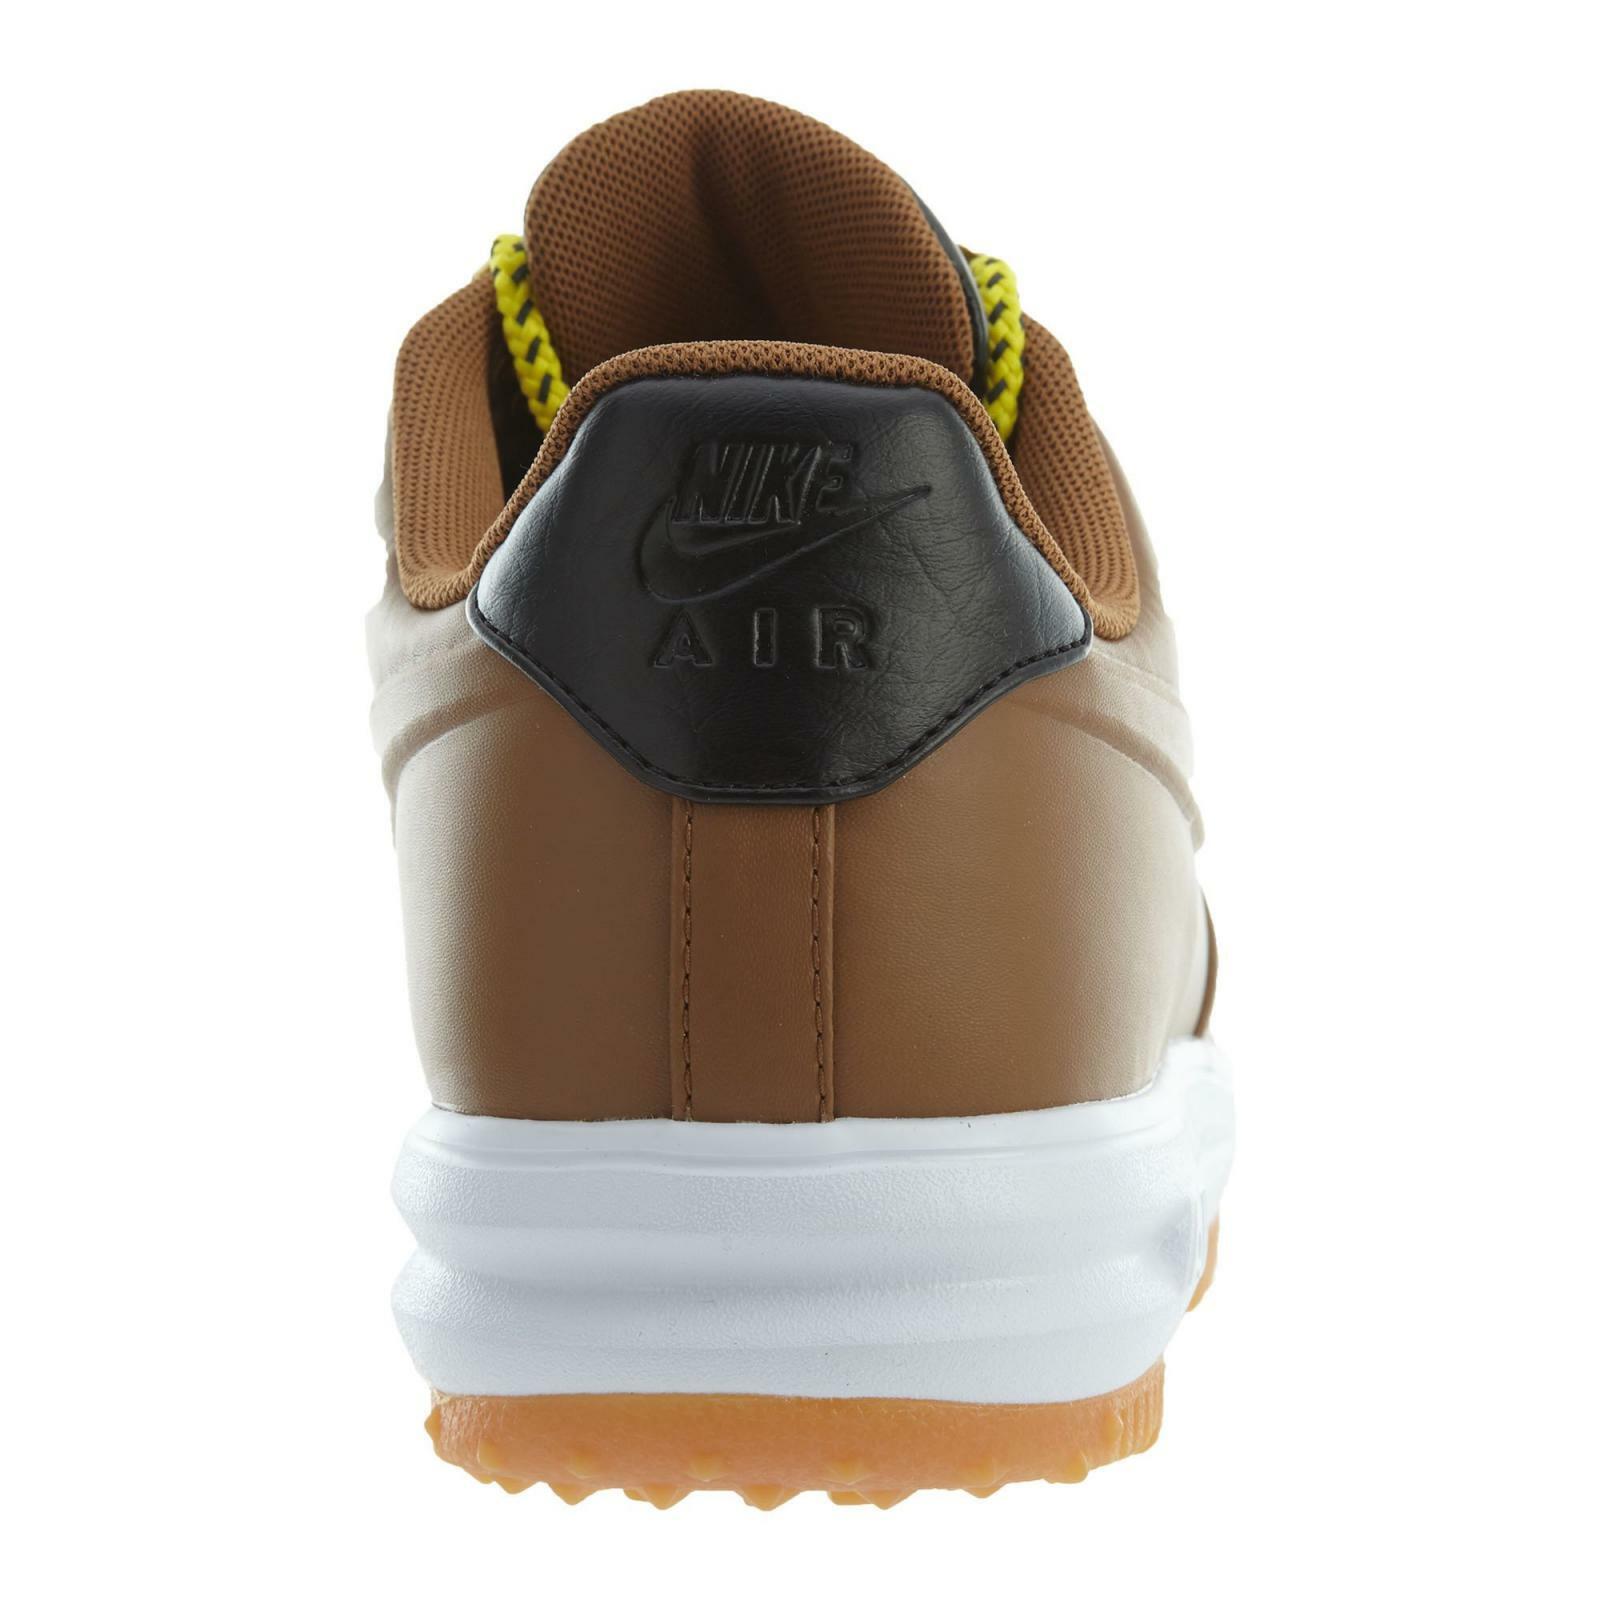 Nike Lunar Force 1 Duckboot Low Trainers UK Size 6 Aa1125 200